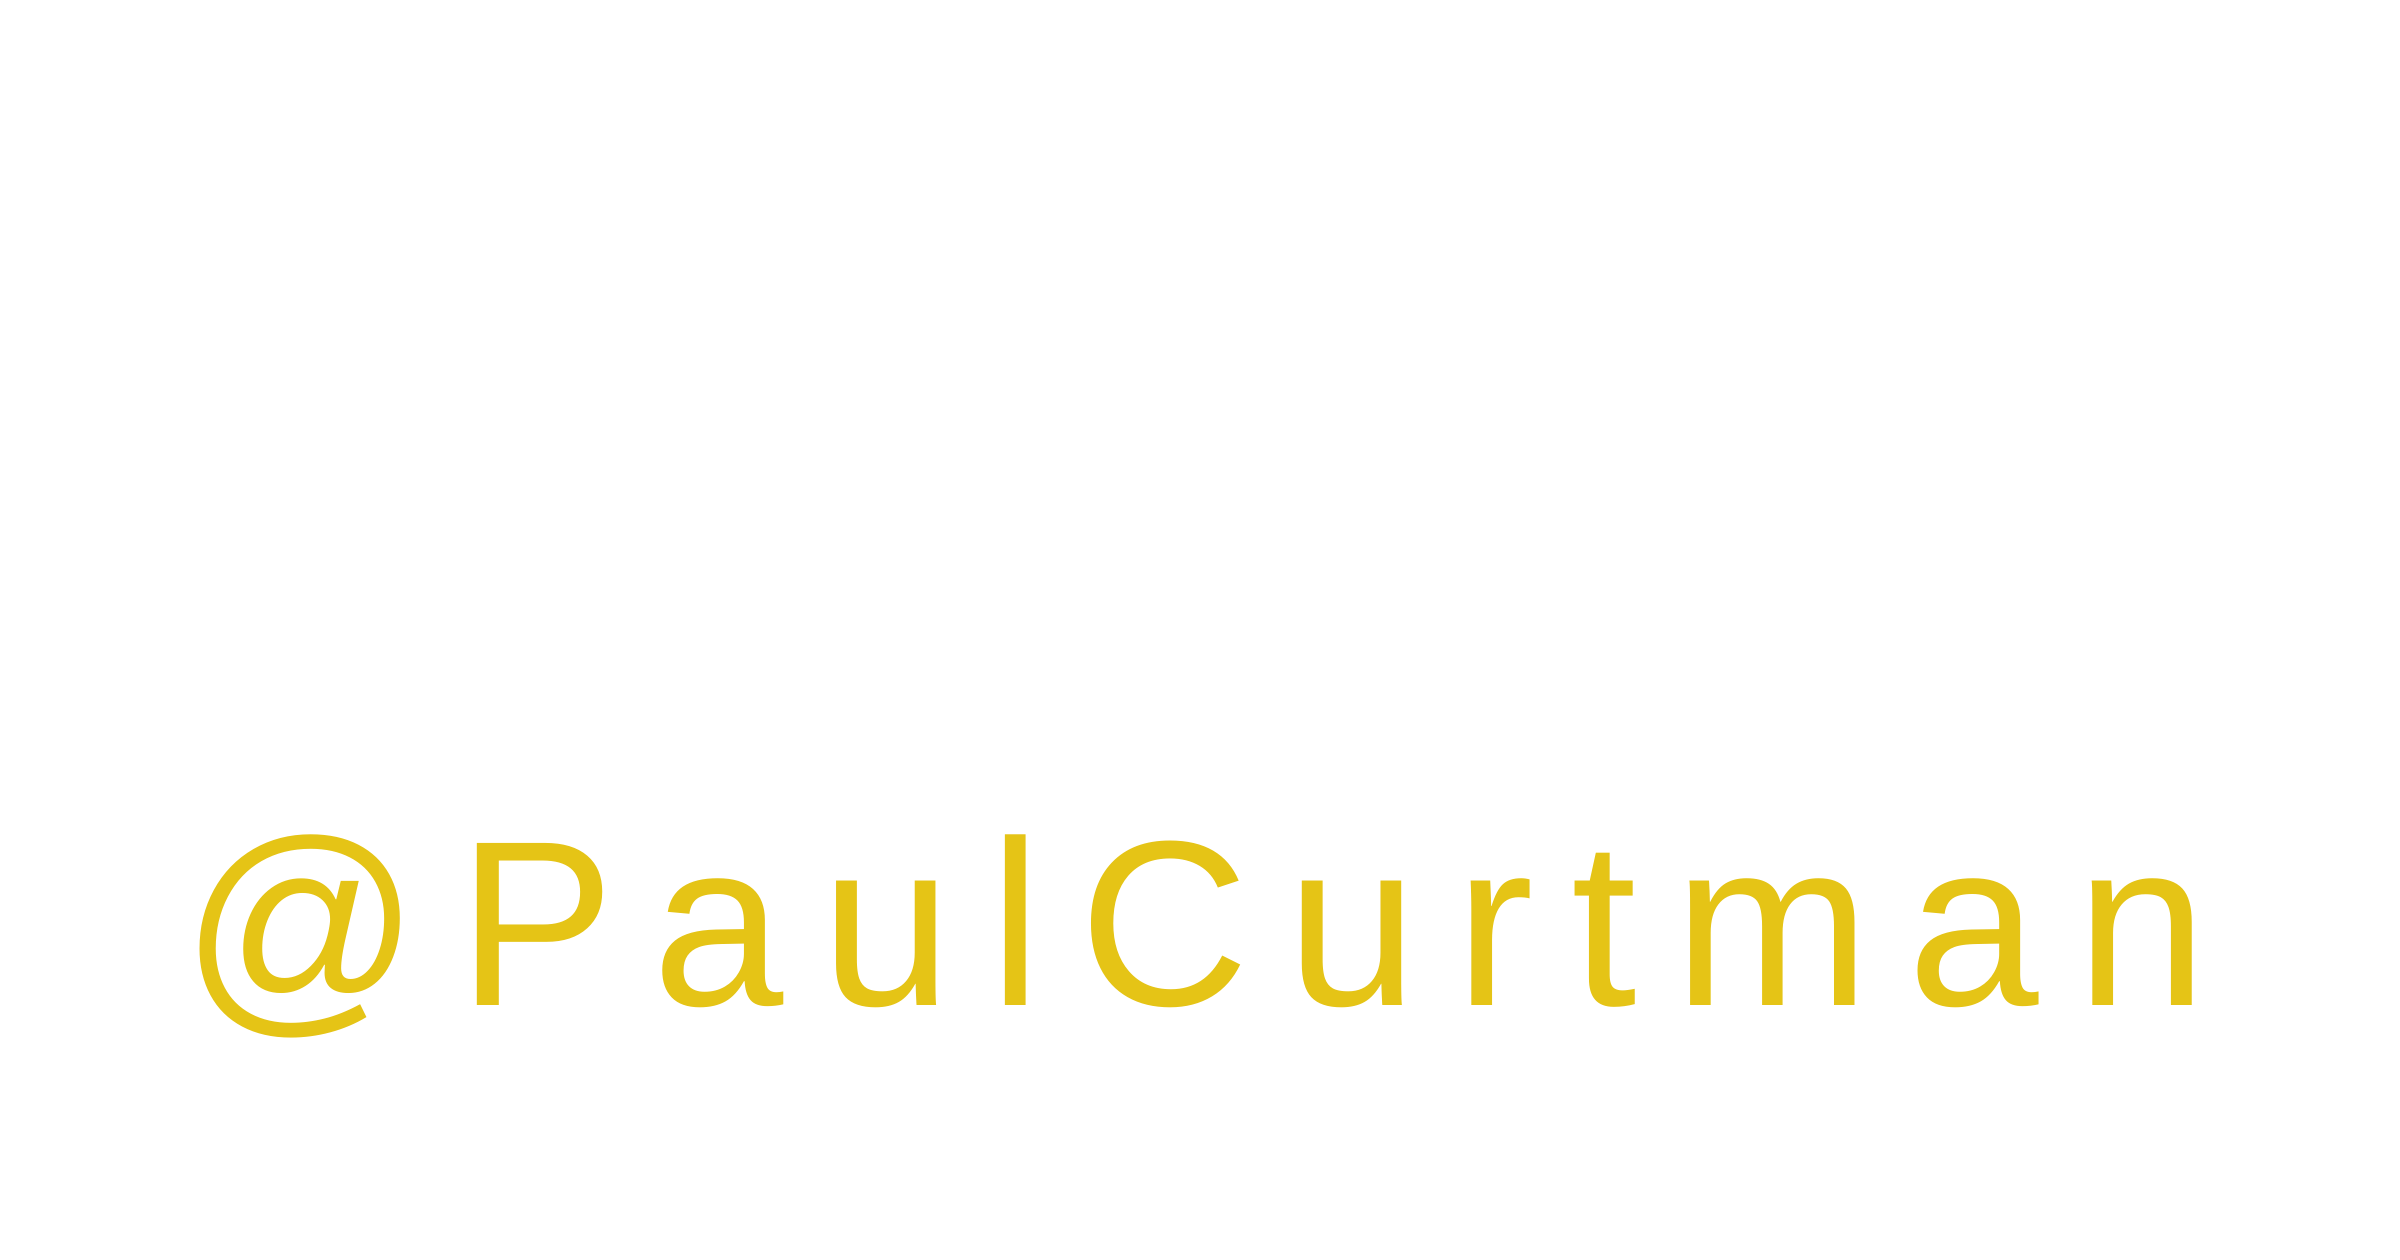 Paul Curtman